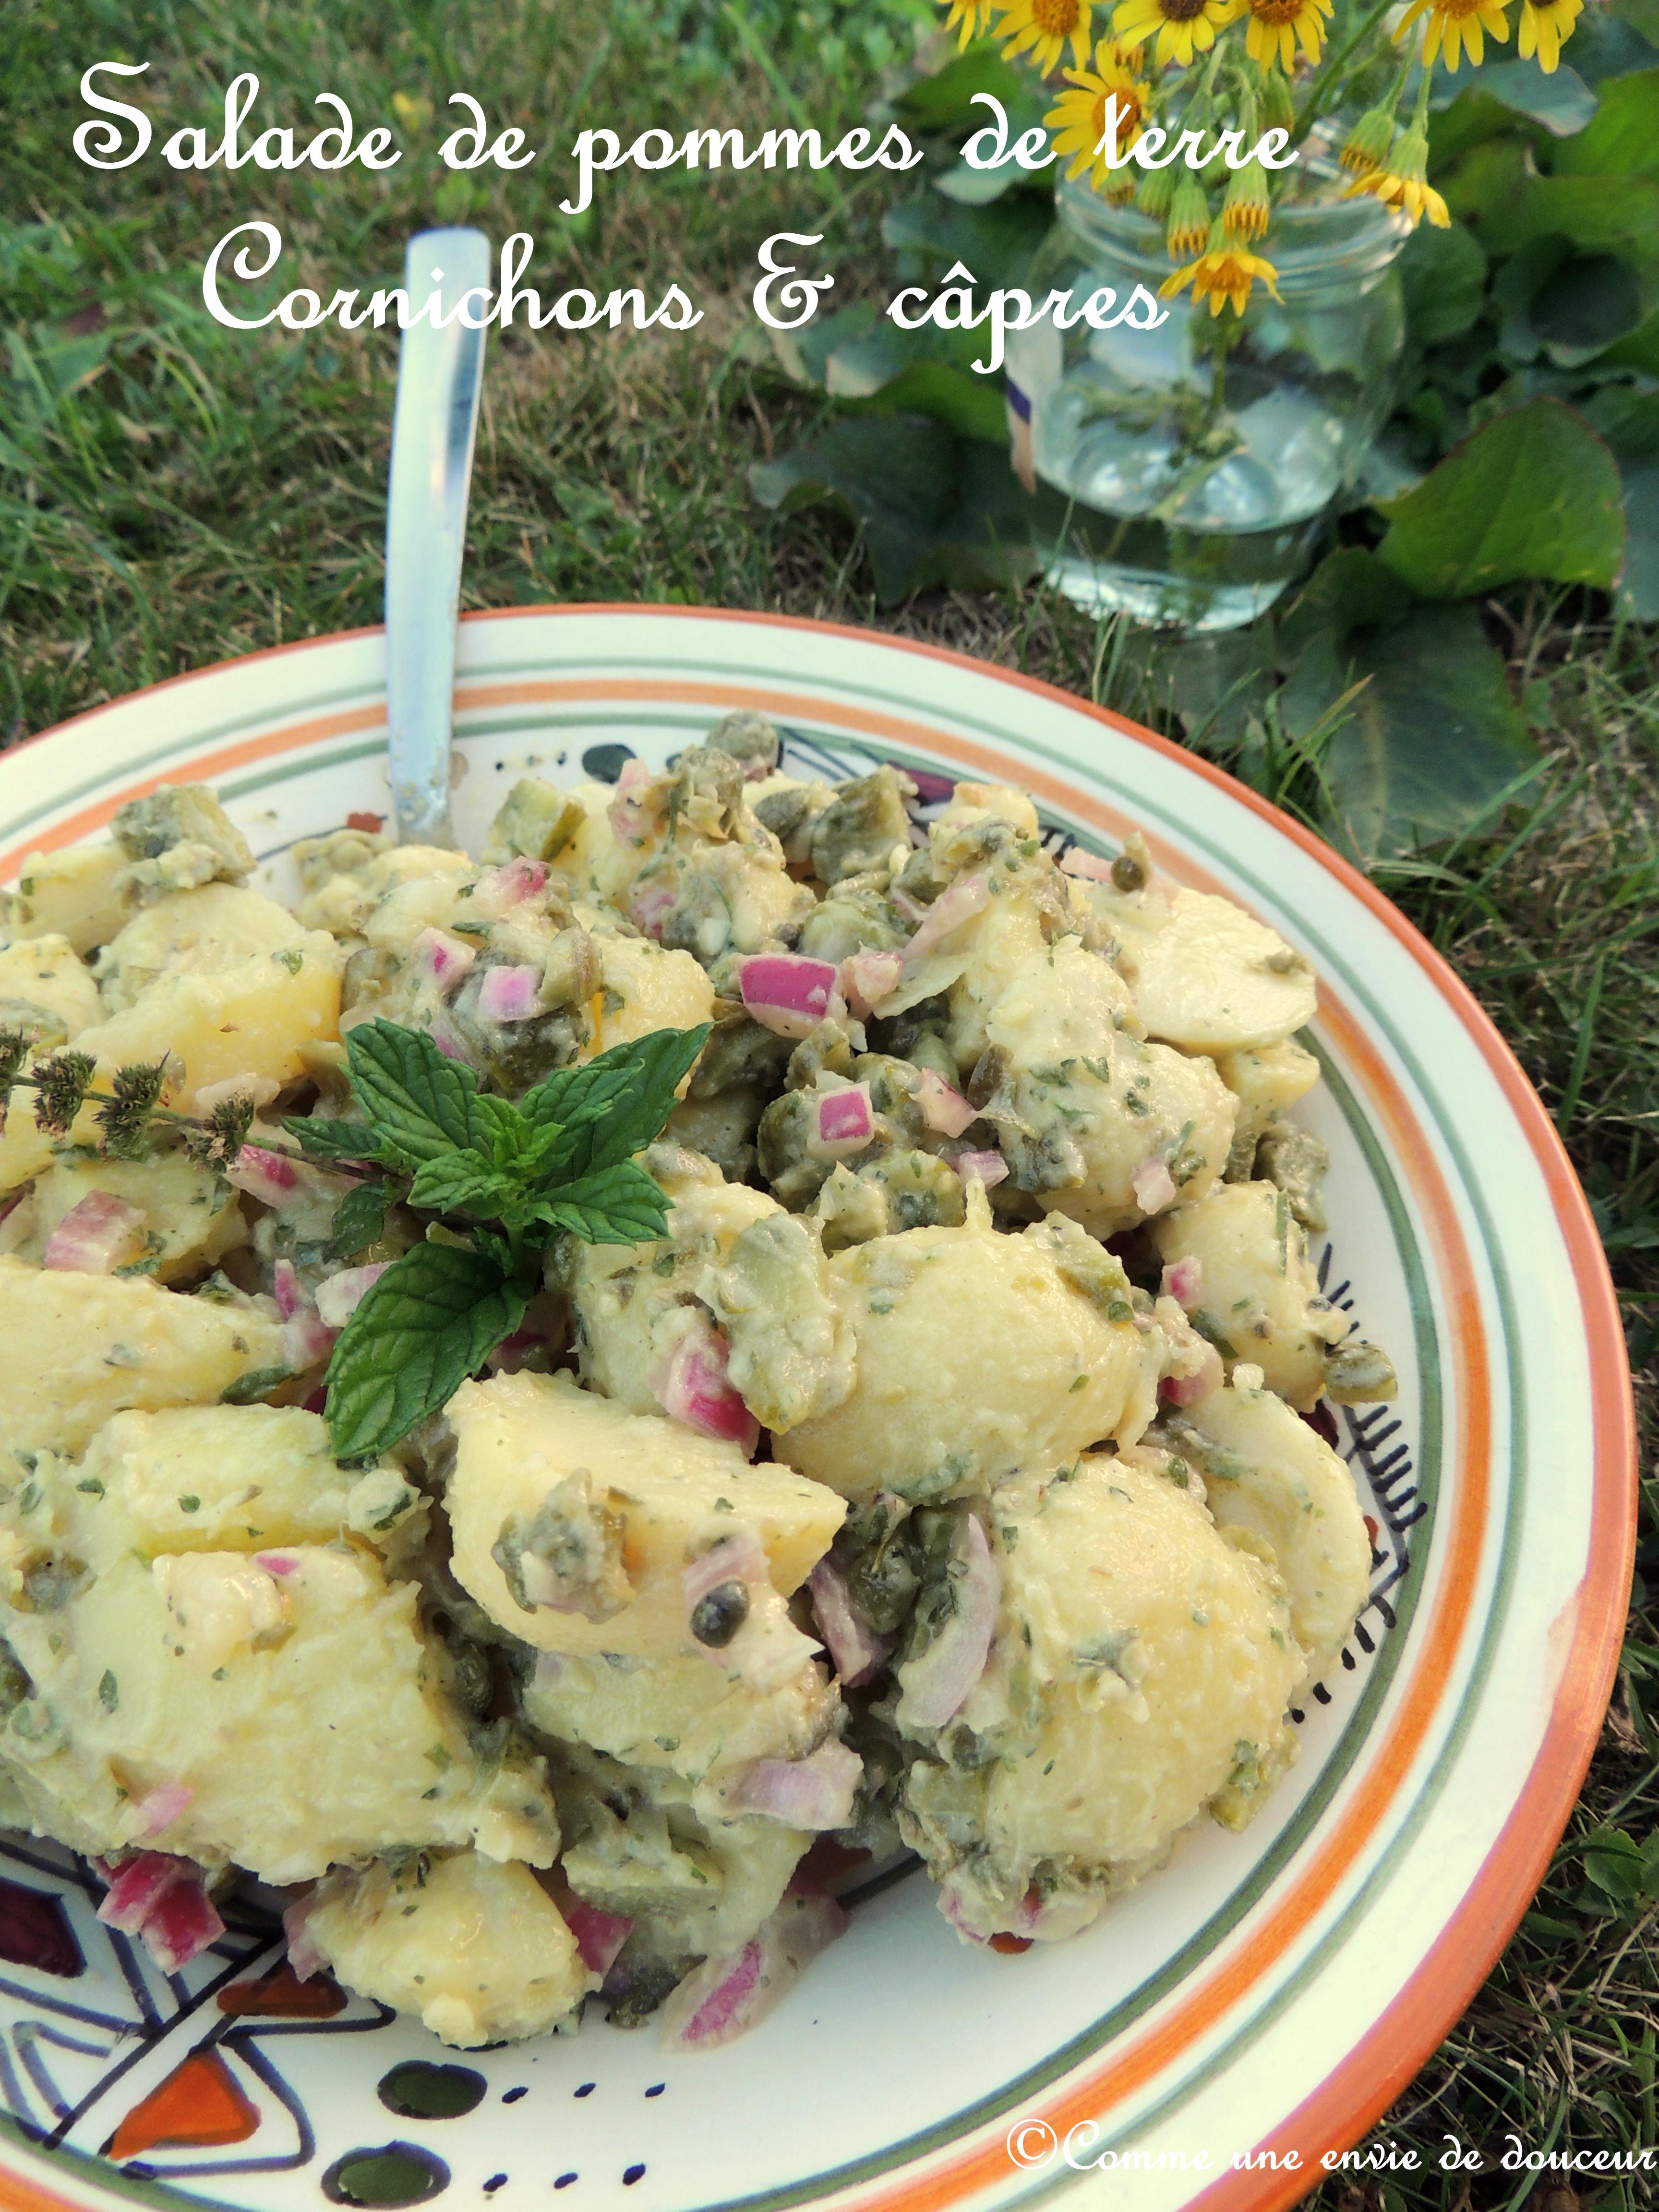 Salade de pommes de terre câpres & cornichons – Capers & gherkins potato salad